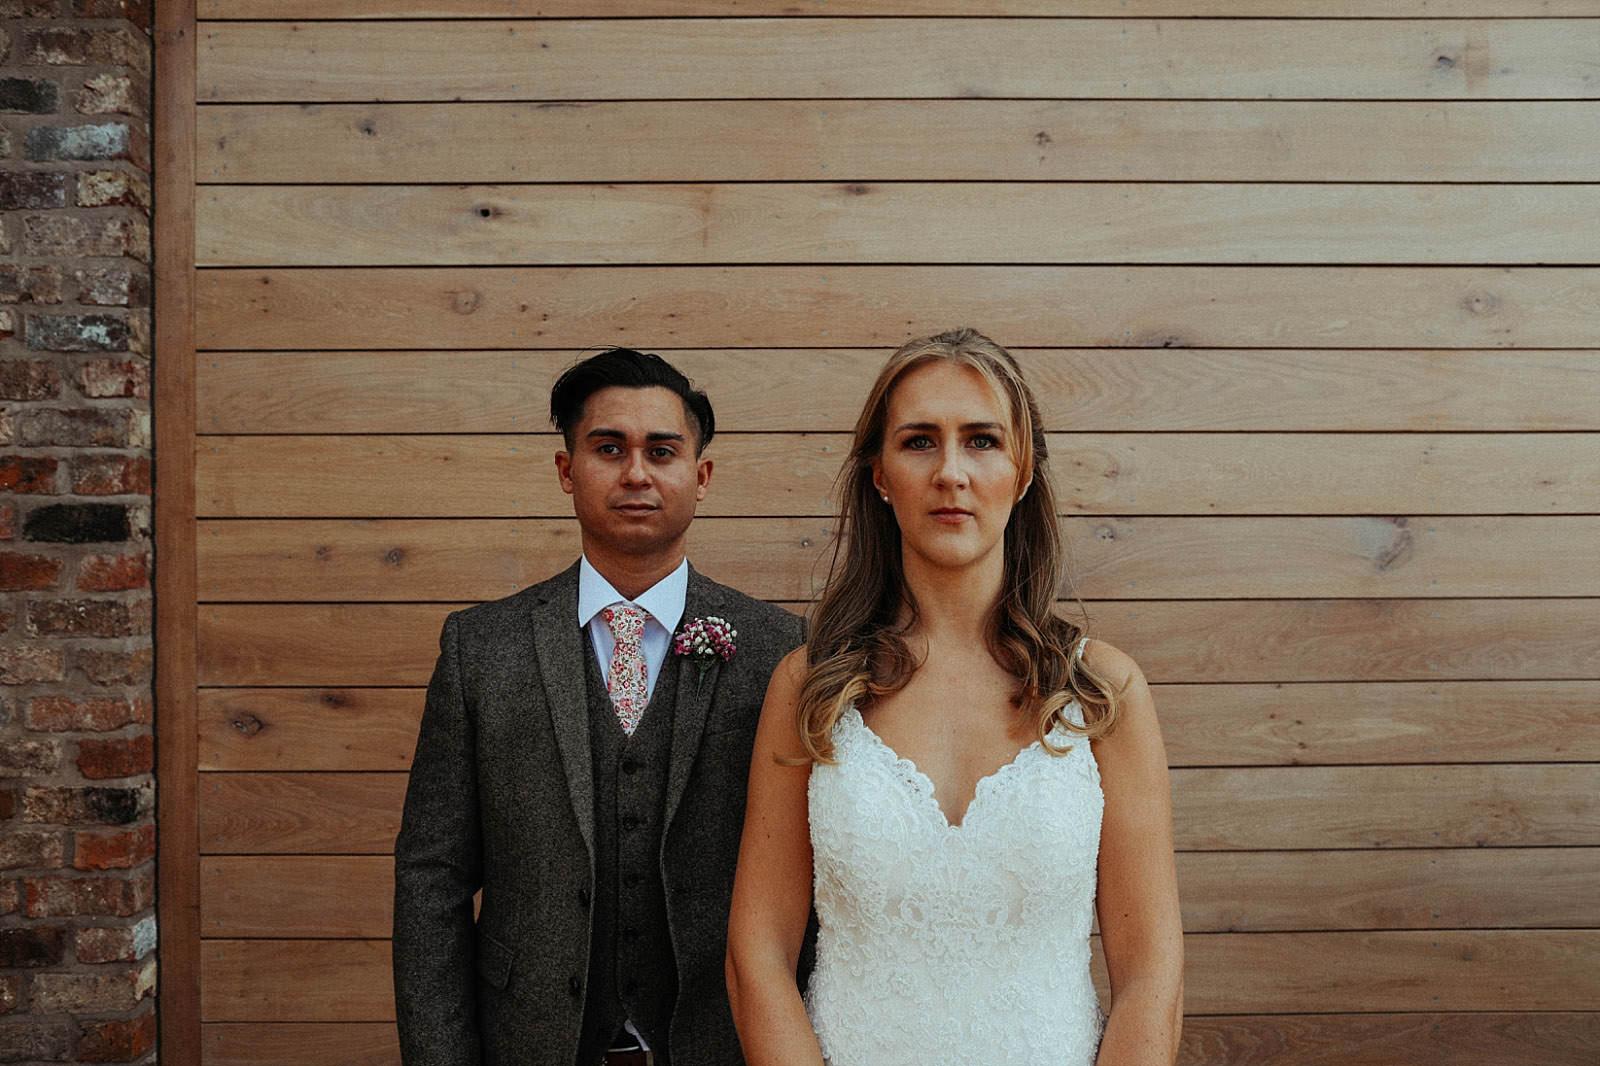 bride and groom looking straight ahead.